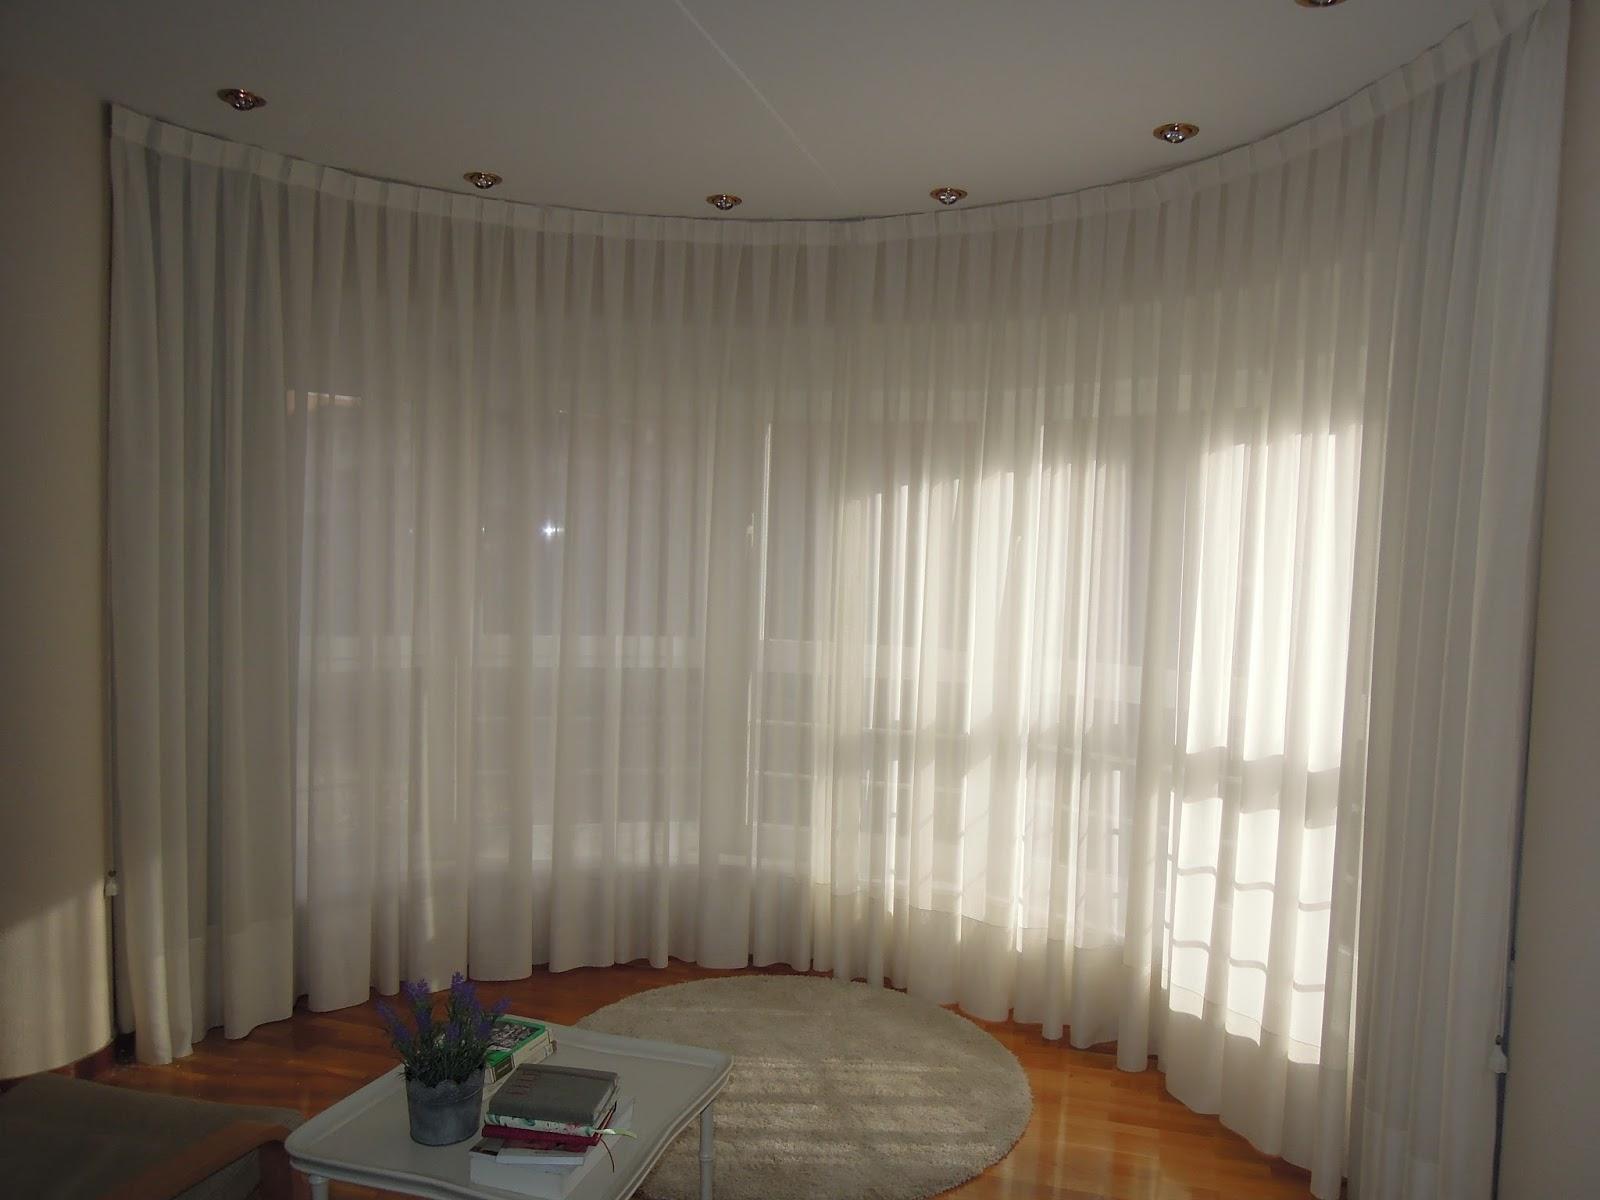 Fotos de cortinas como elegir unas cortinas aqui os for Modelos de cortinas para salon moderno